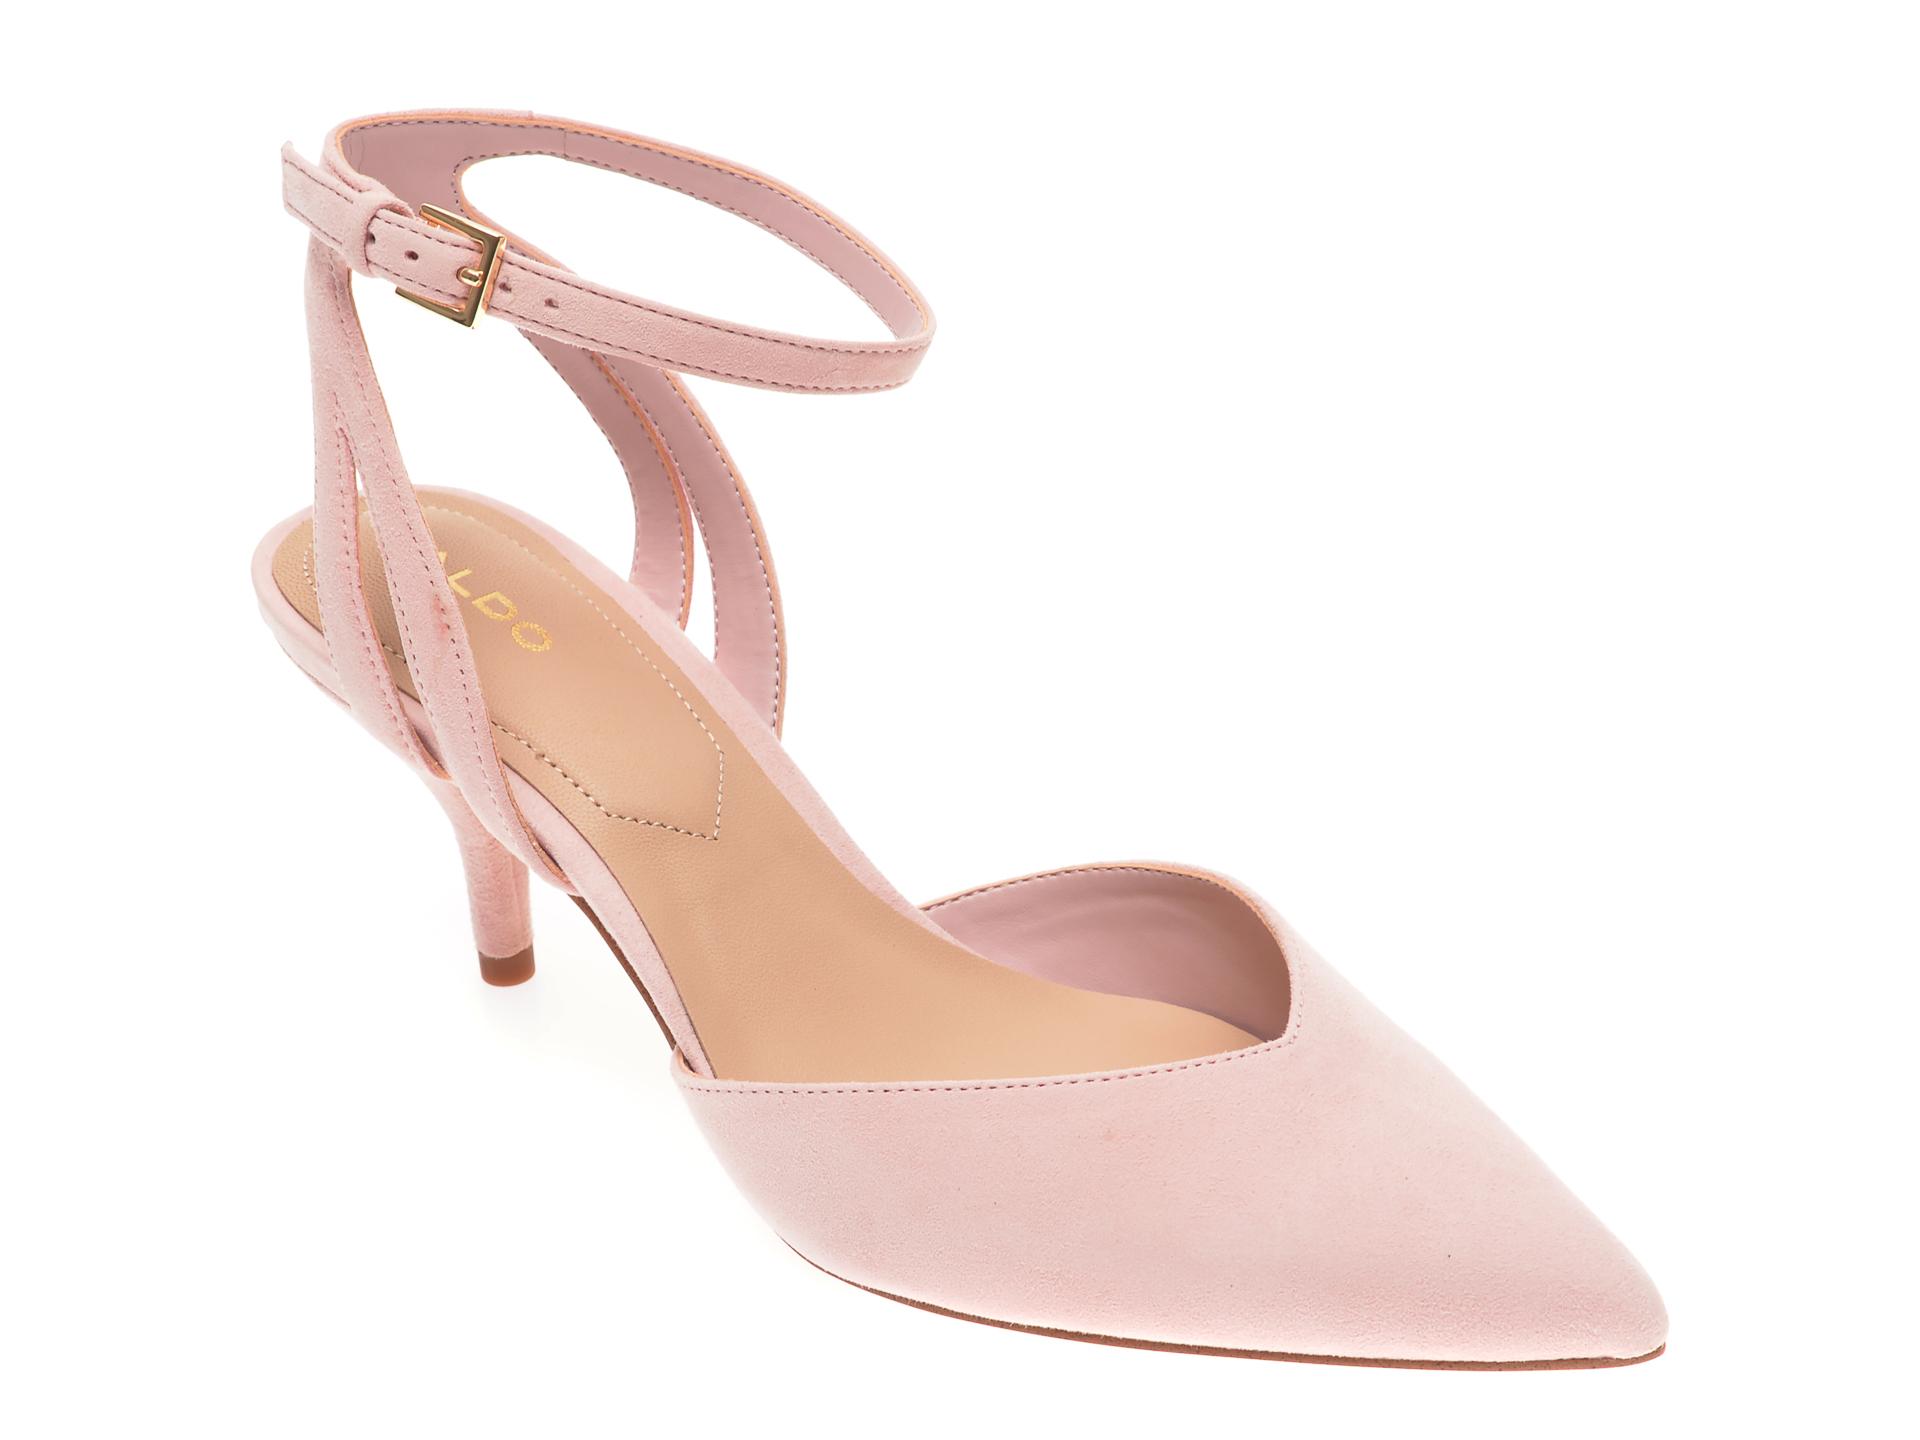 Pantofi ALDO roz, Krasnoya680, din piele intoarsa imagine otter.ro 2021